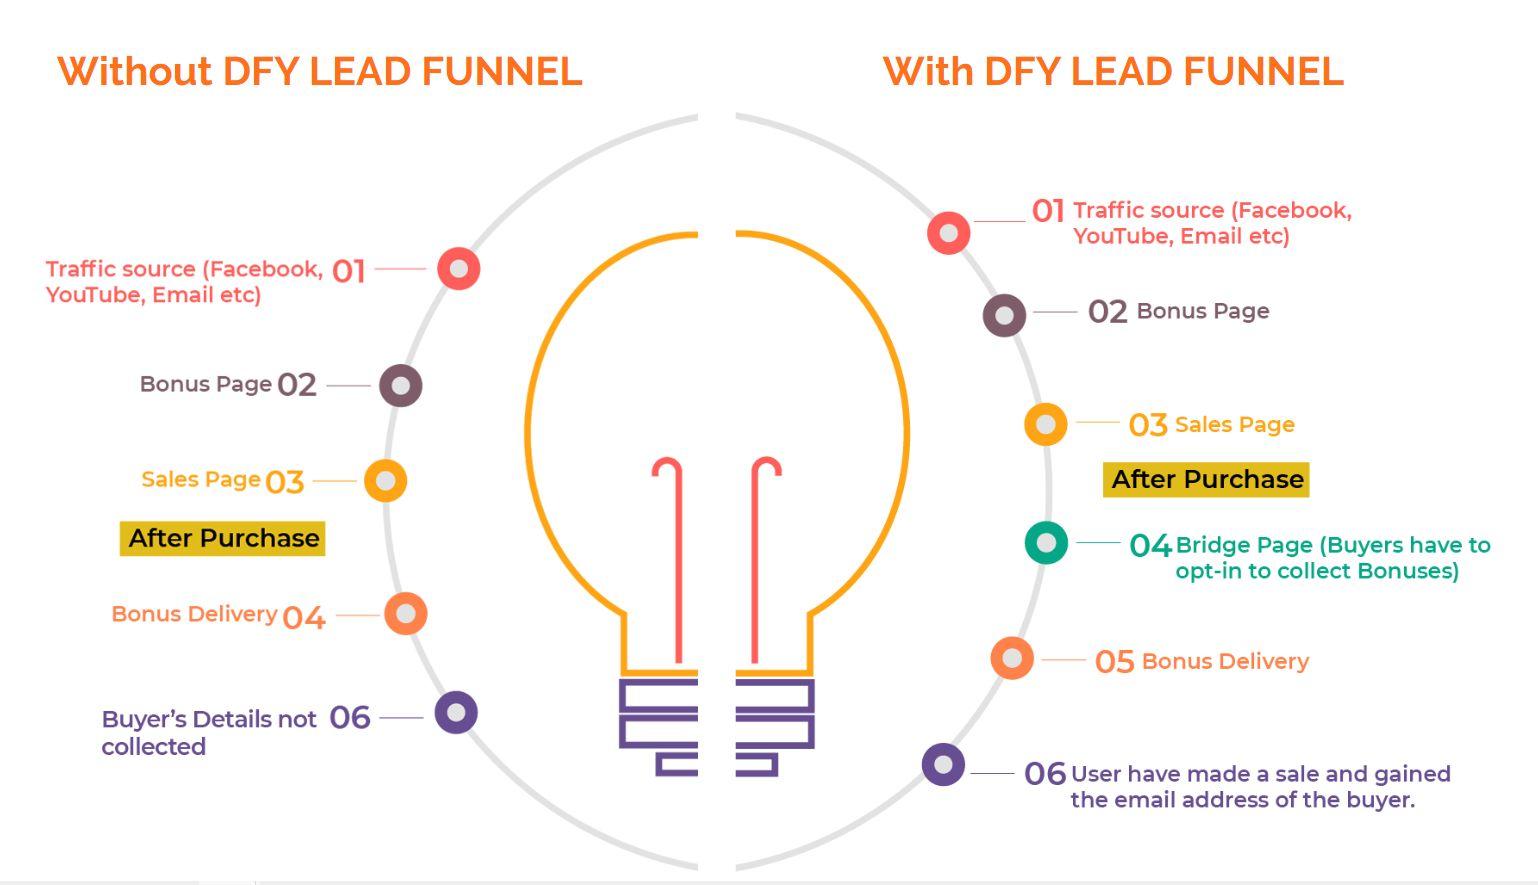 DFY-LeadFunnels-Benefits